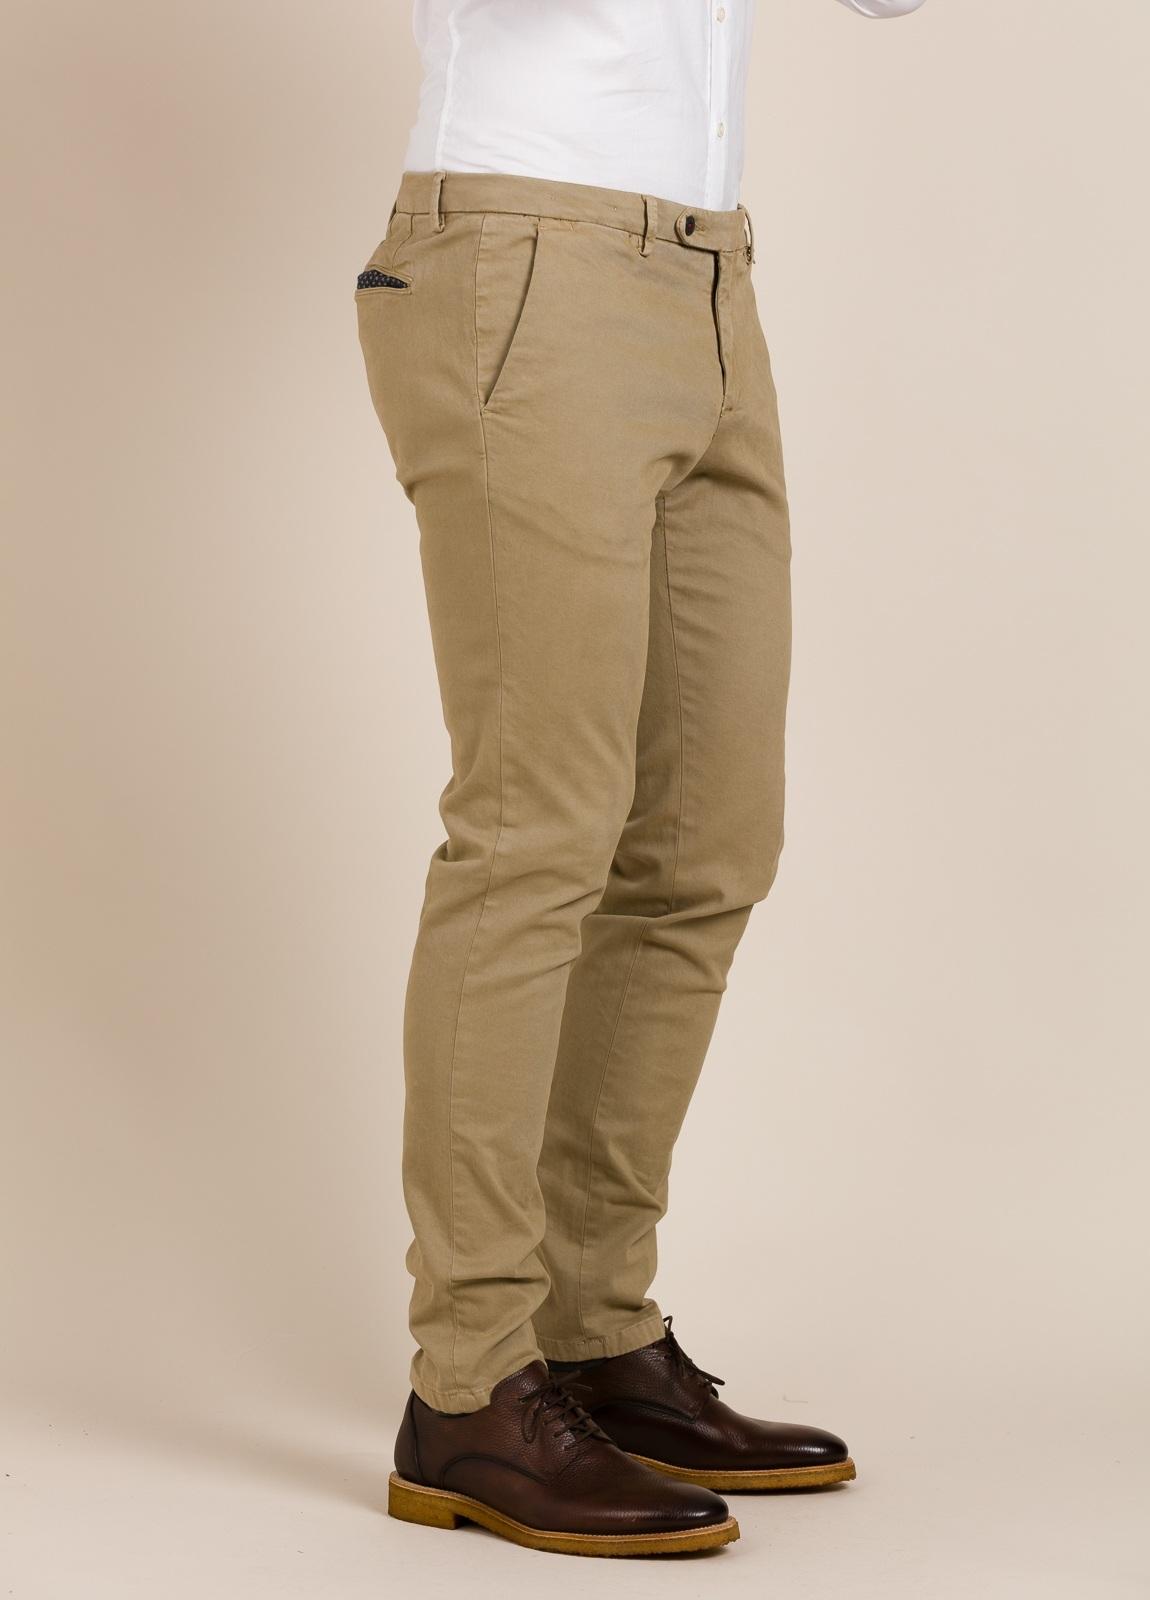 Pantalón chino PAOLONI beige. - Ítem2